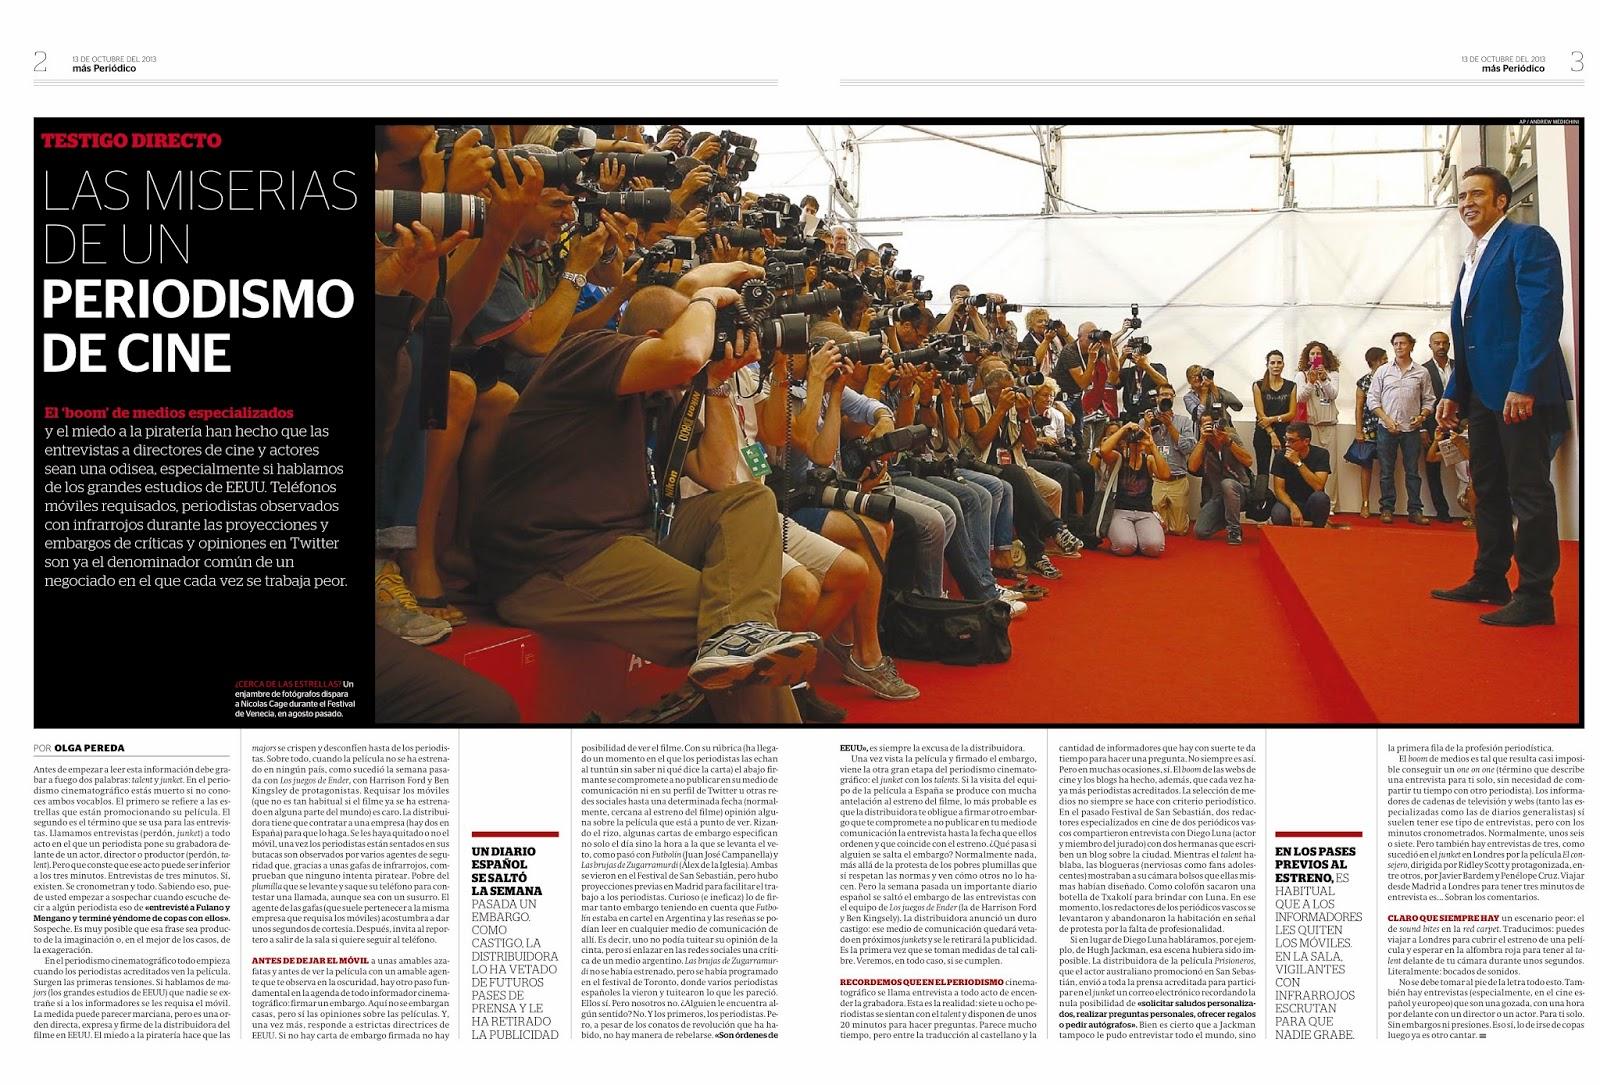 Analisis periodismo cine. Premiojpg